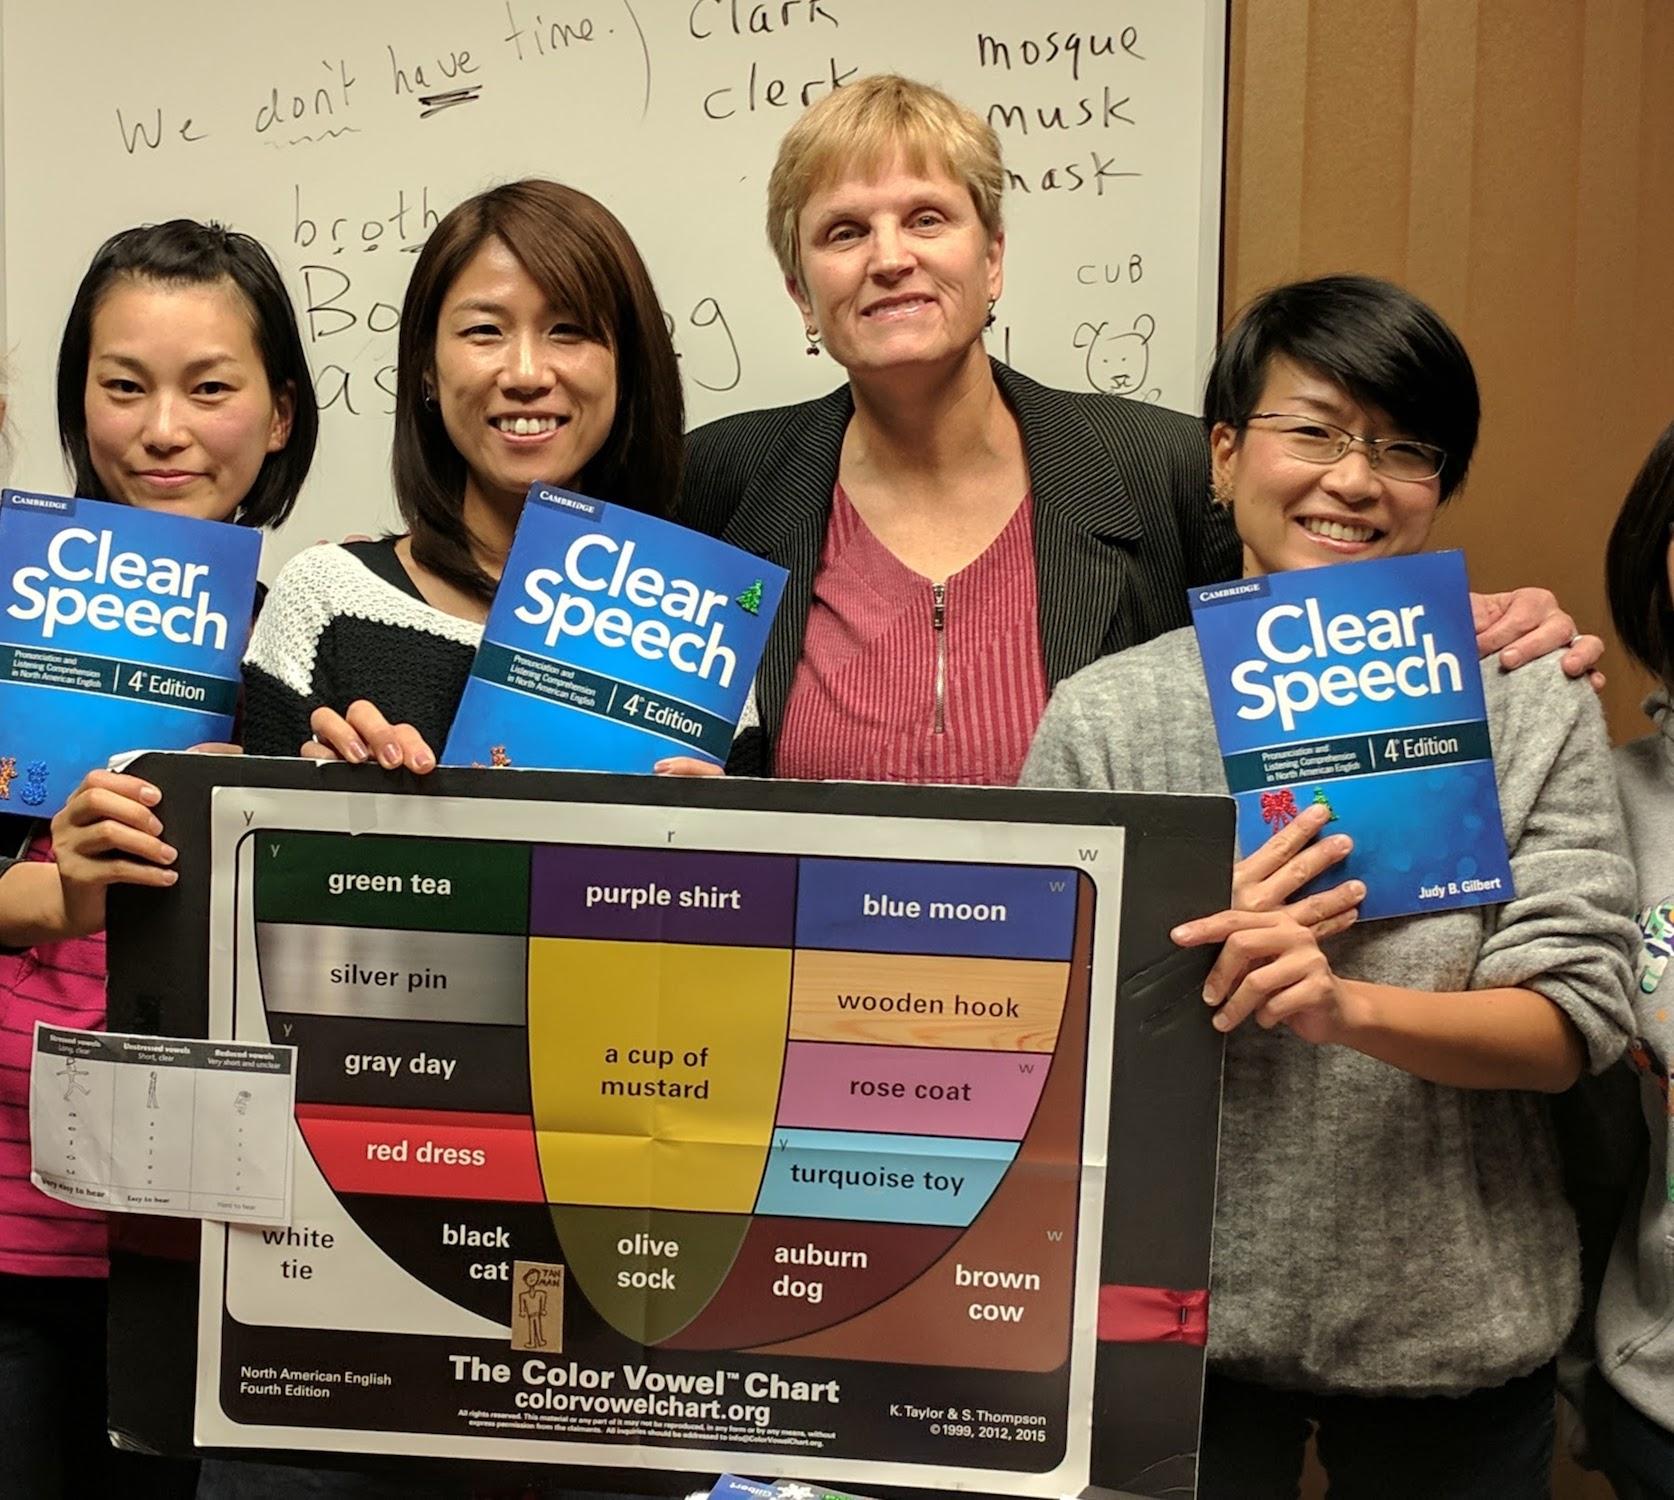 Liz Bigler, of Bigler ESL, teaching intensive accent reduction course to Japanese speakers of English